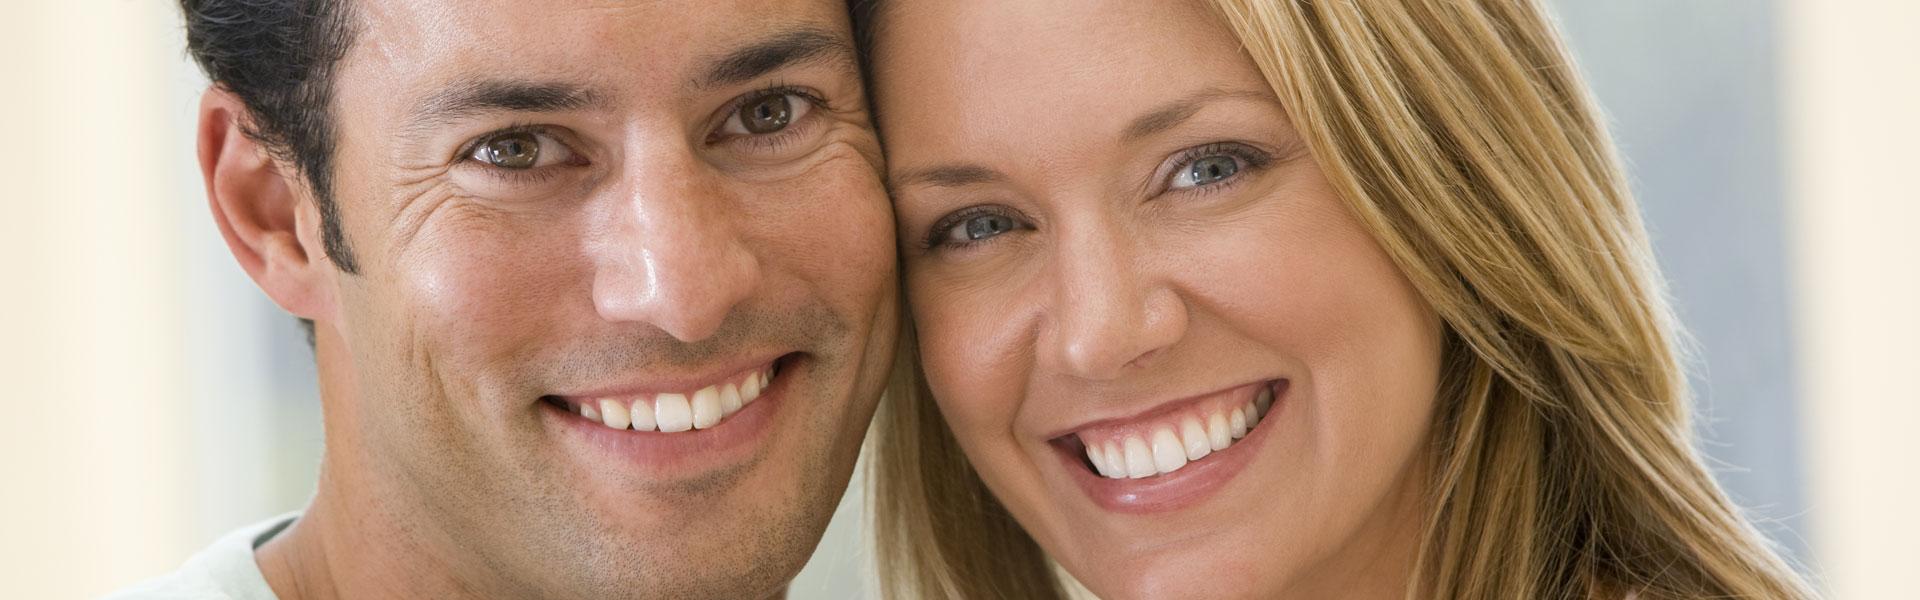 happy couple with perfect smiles